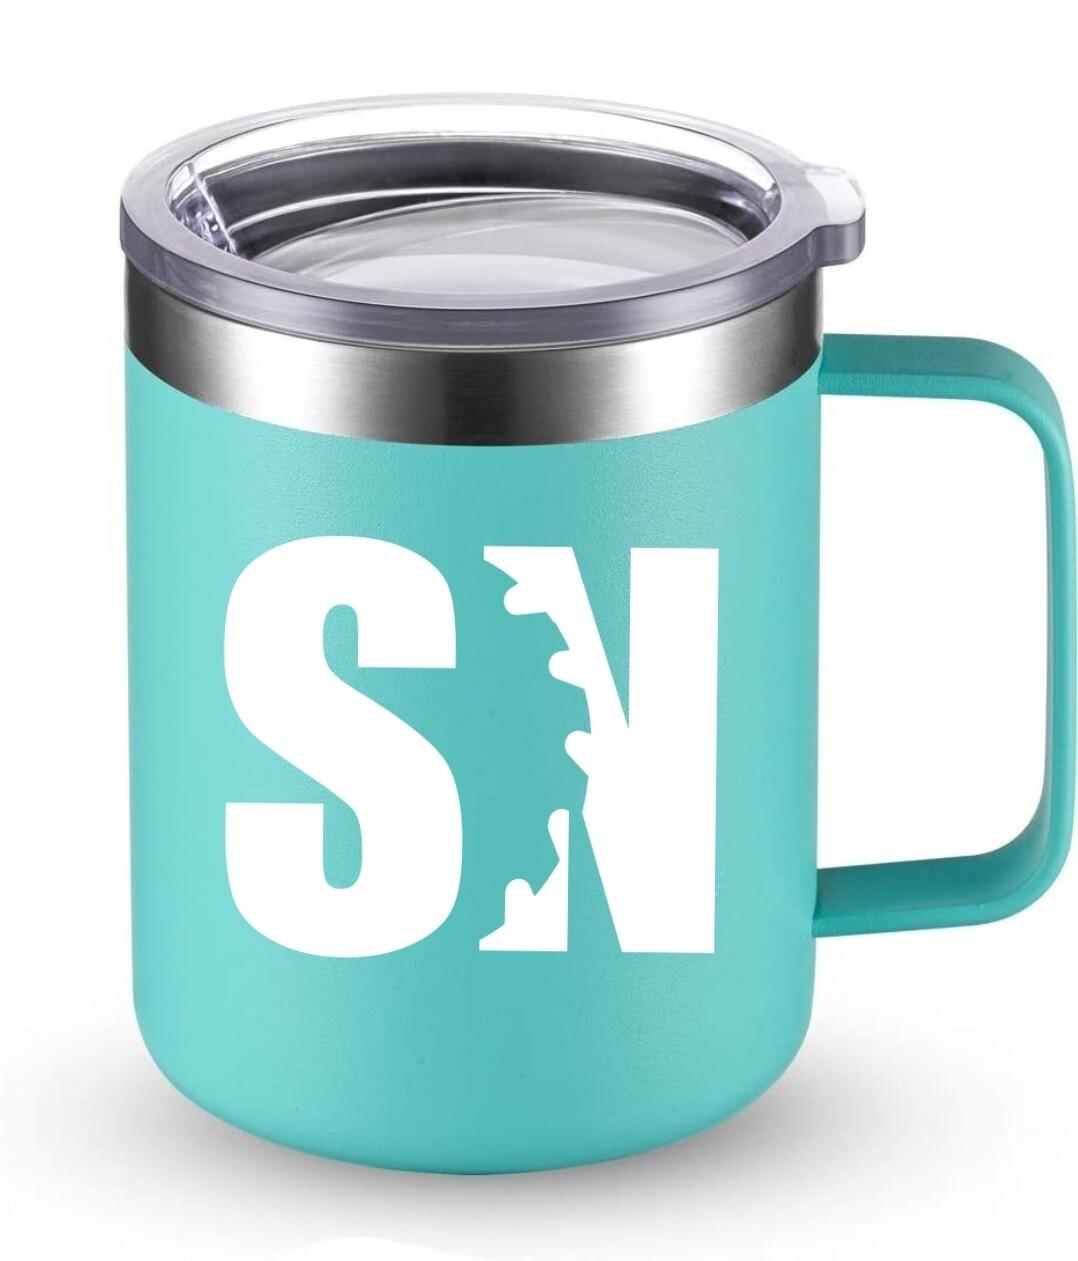 Teal Sawdust Nation Insulated Mug with Lid